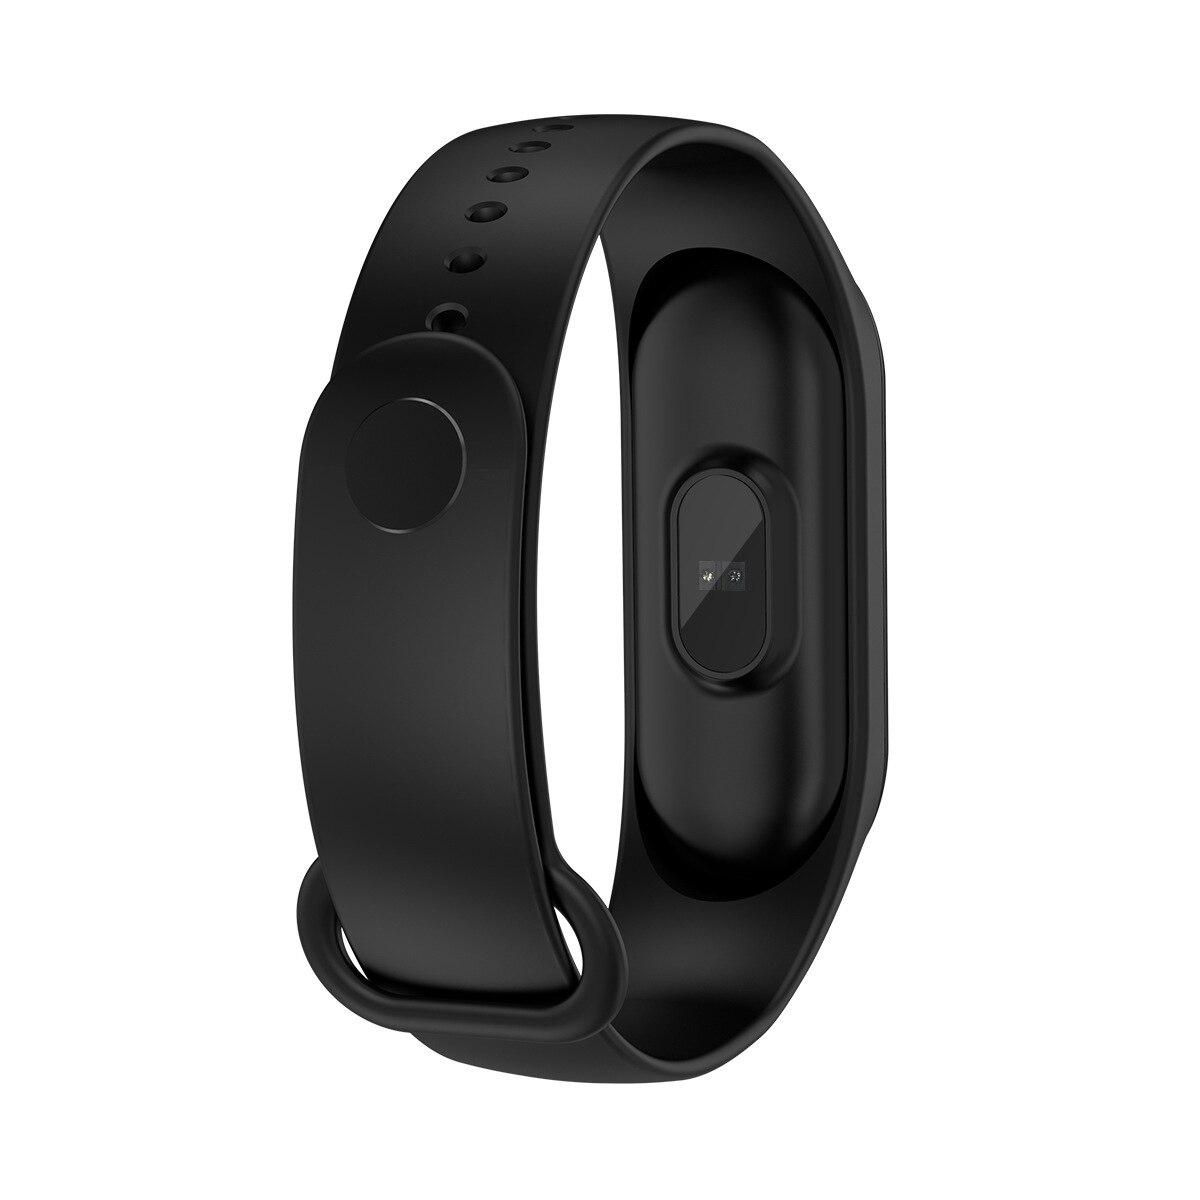 Hf100e30b56f7476882756030e8e499c2A New M4 Smart Band Fitness Tracker Smart Watch Sport Smart Bracelet Heart Rate Blood Pressure Smartband Monitor Health Wristband